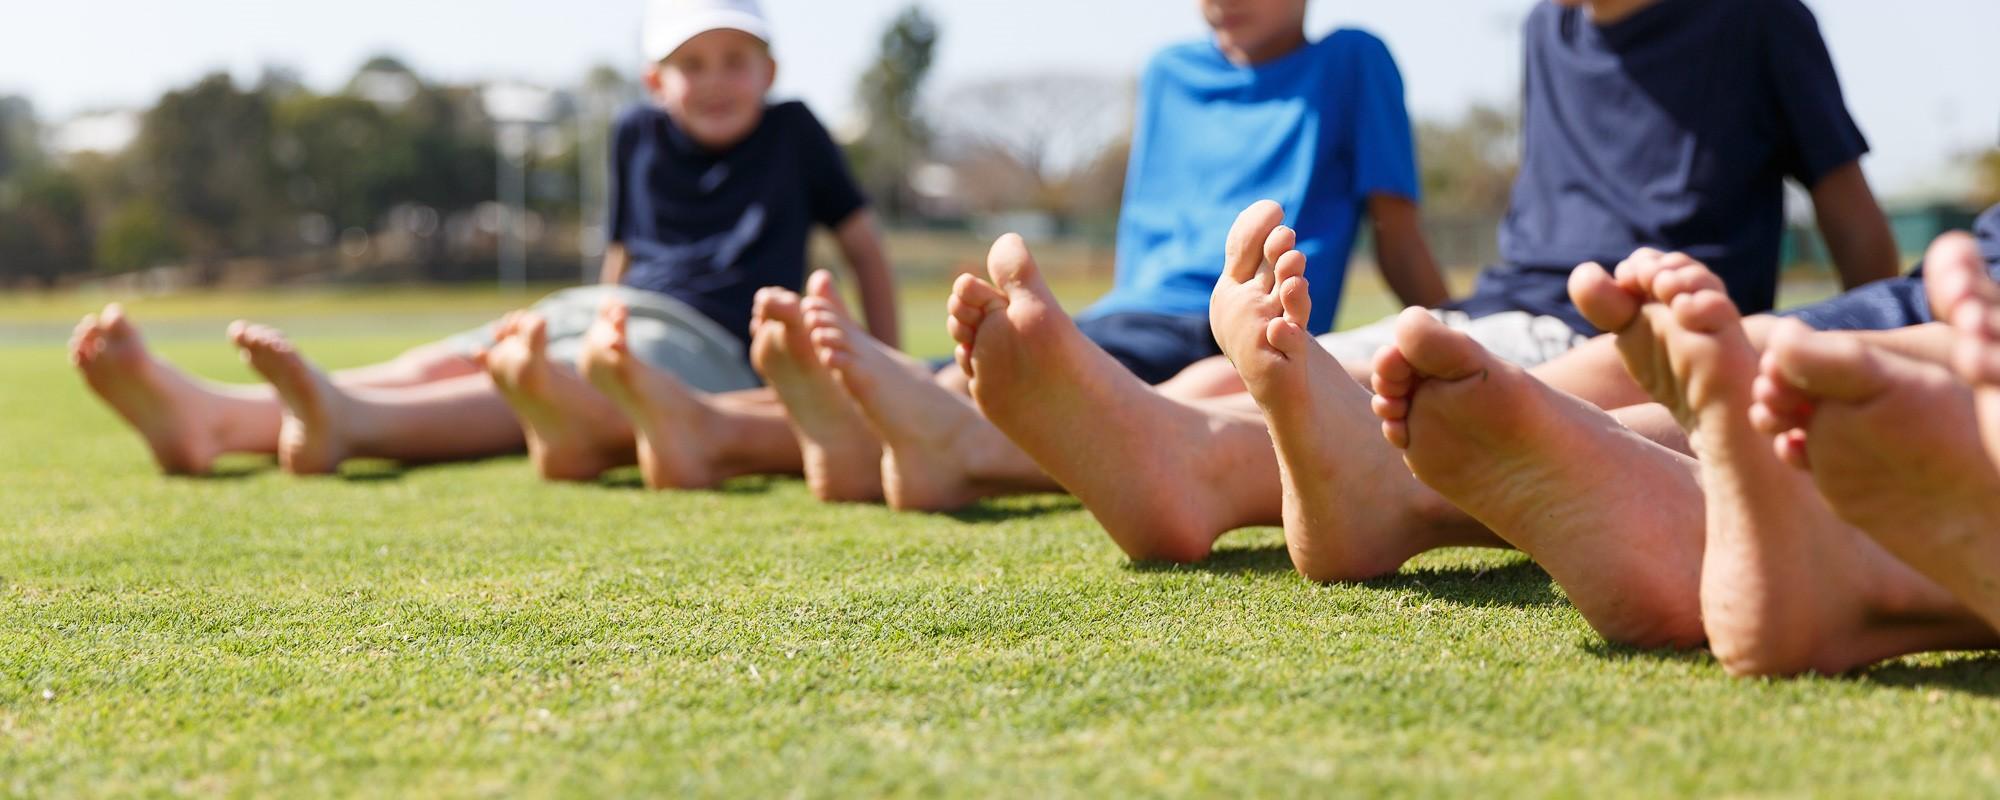 Children's Podiatry Kids Foot Health